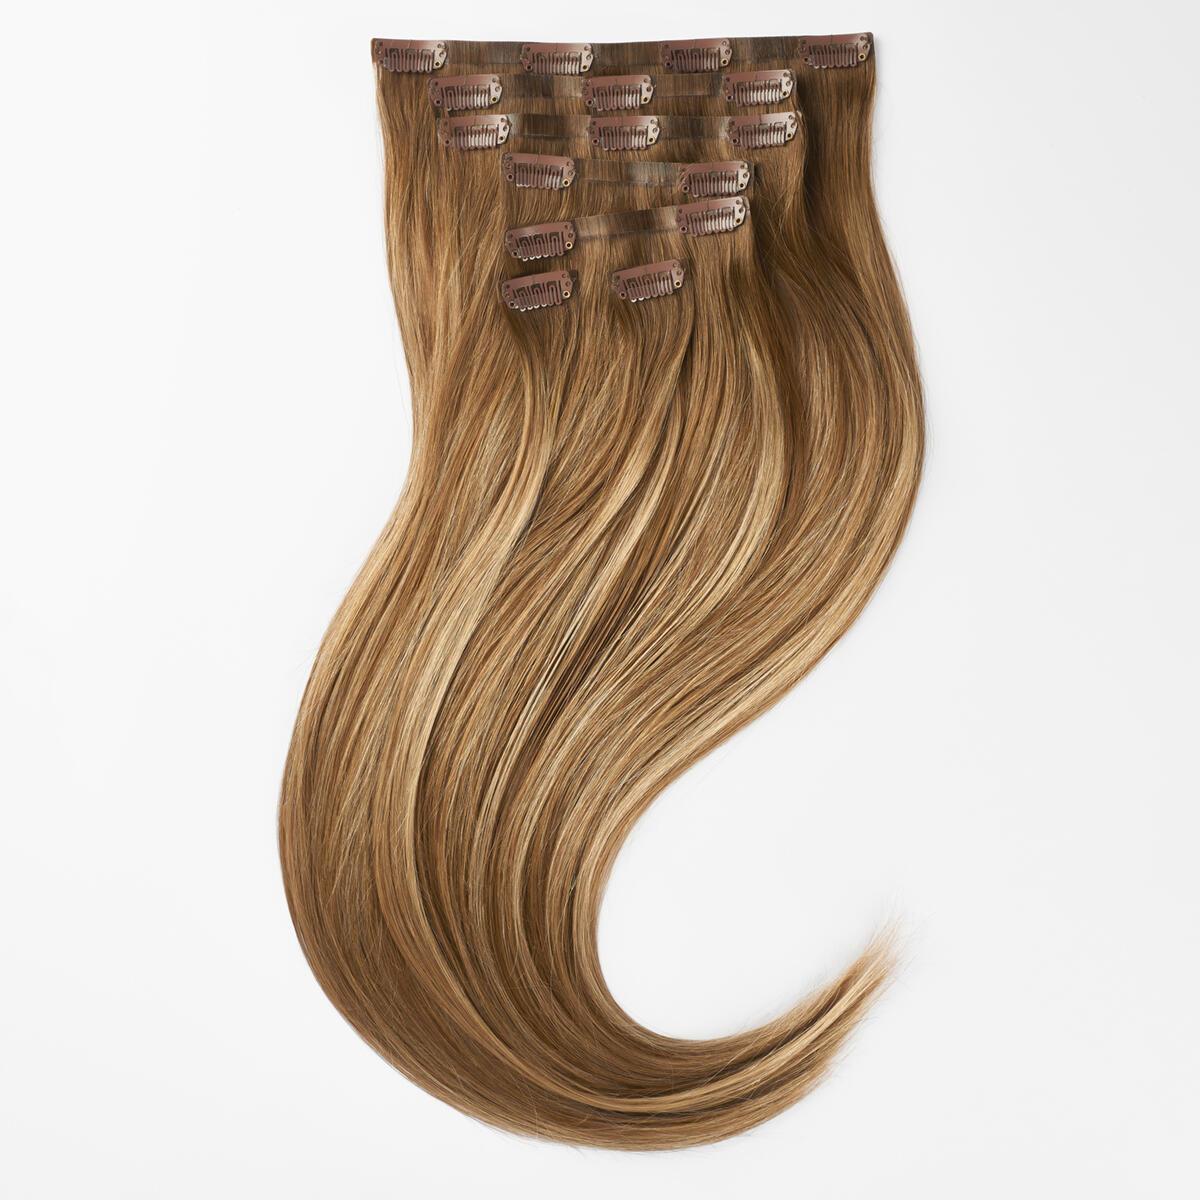 Sleek Clip-on set B5.0/8.3 Brownish Blonde Balayage 50 cm